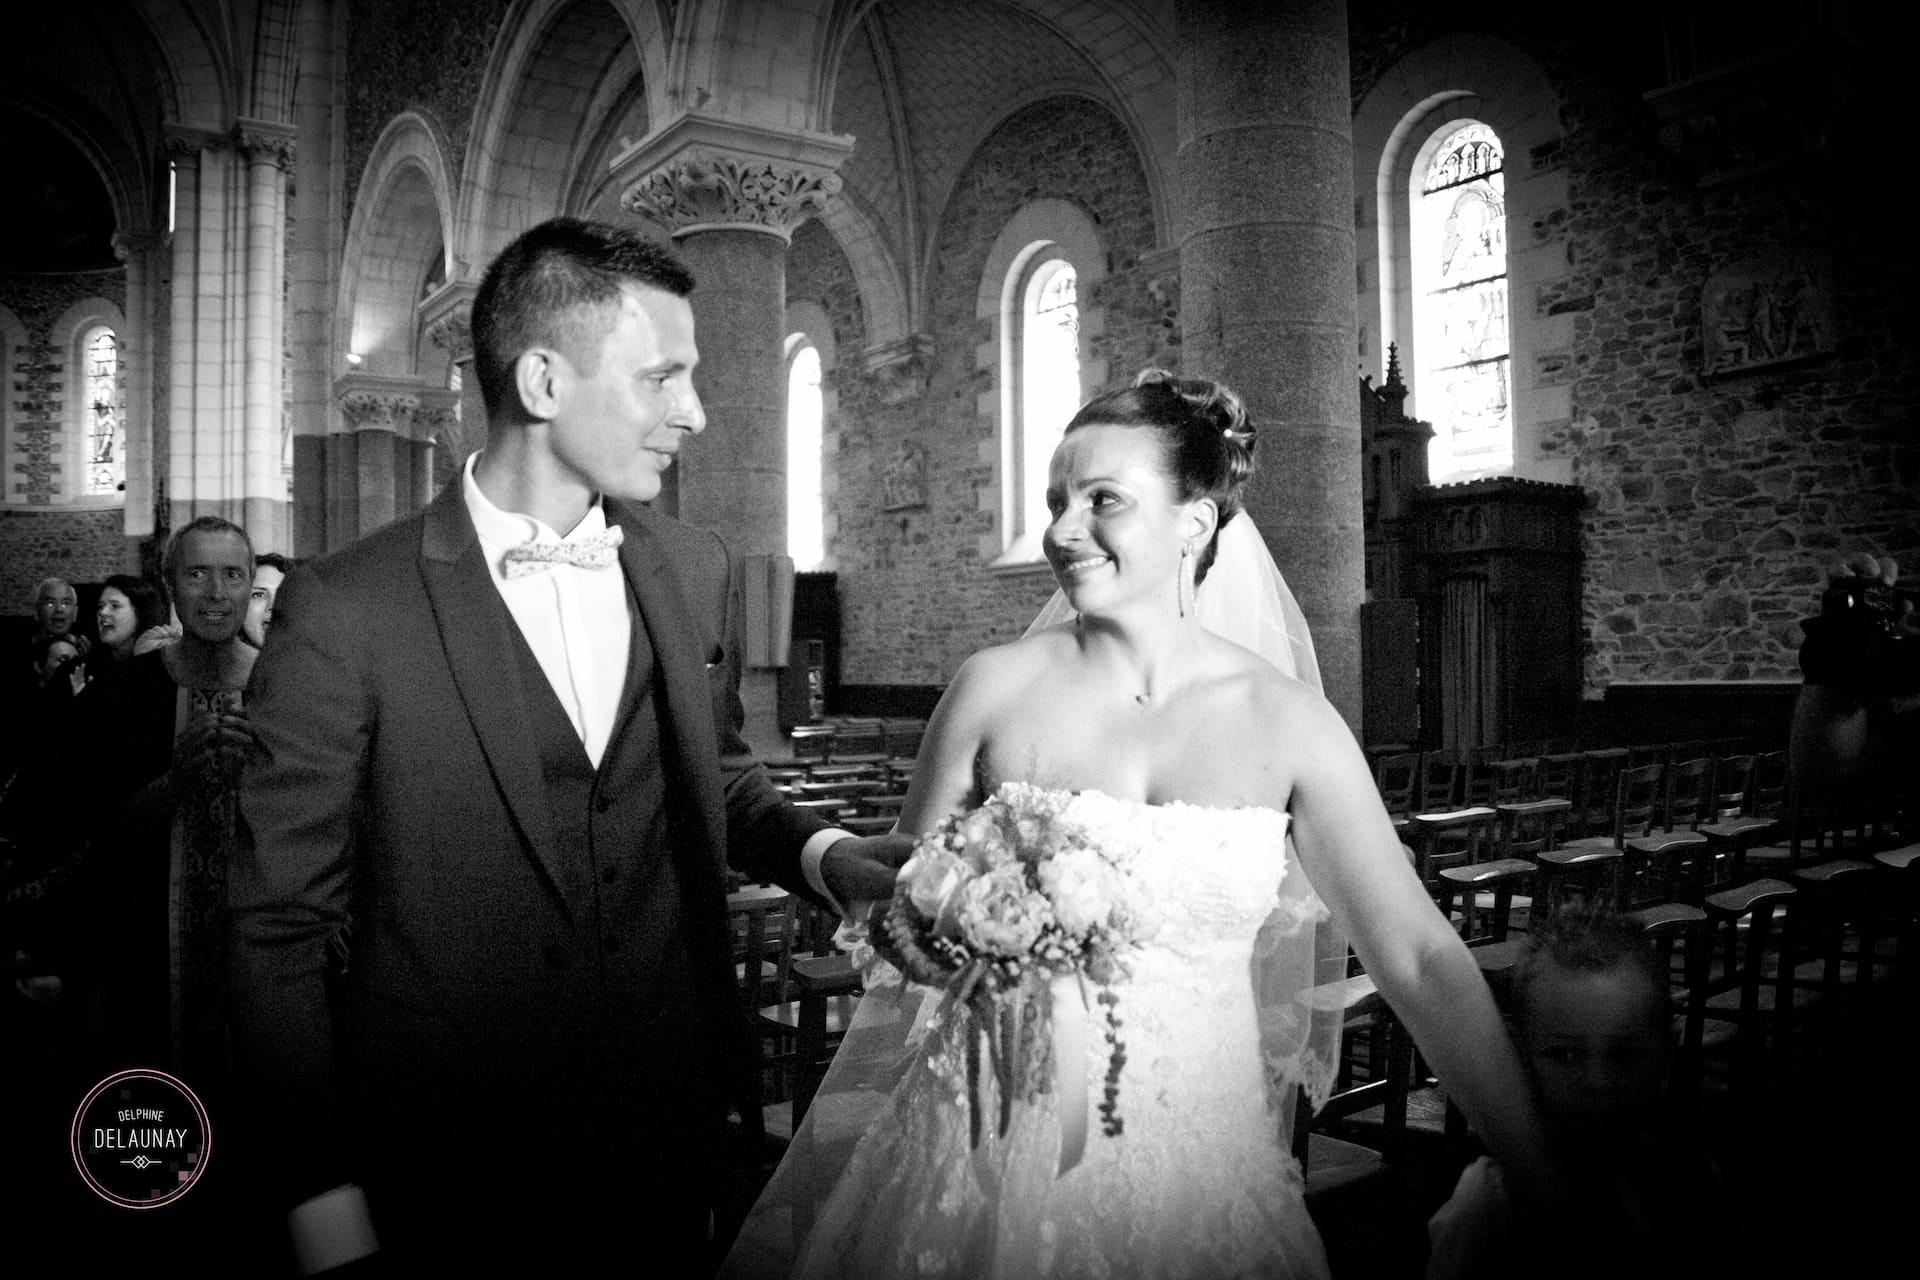 delphine-delaunay-photographe-savenay-mariage-54